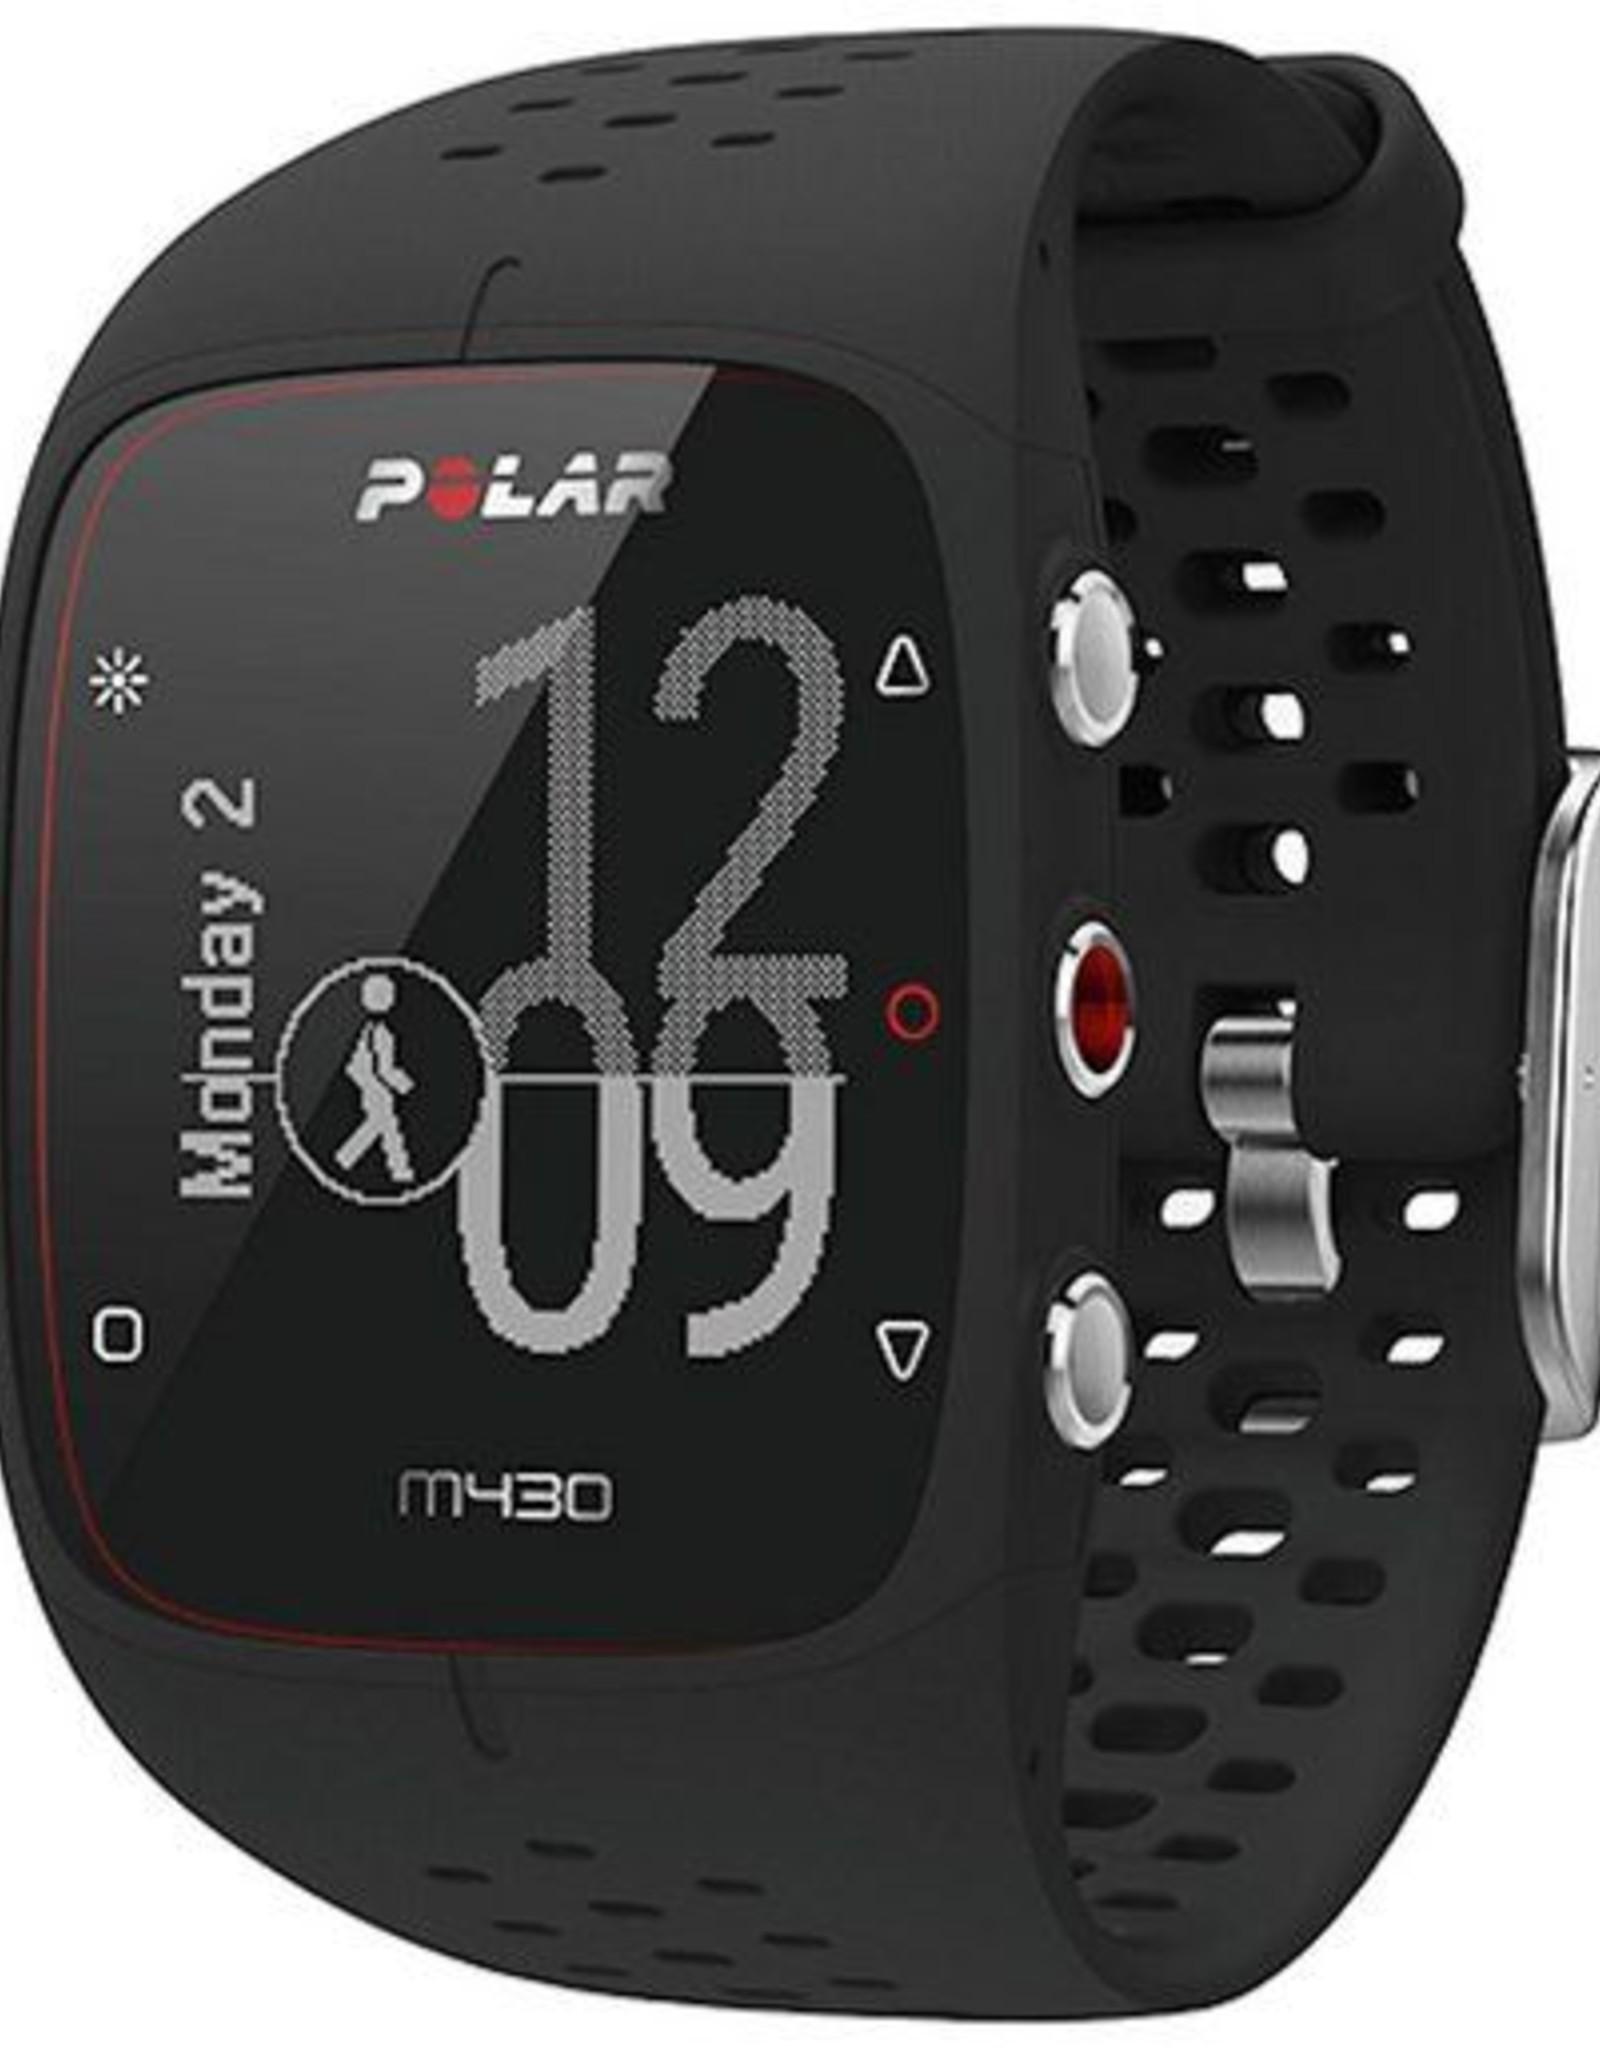 Polar Polar M430 GPS Running Watch